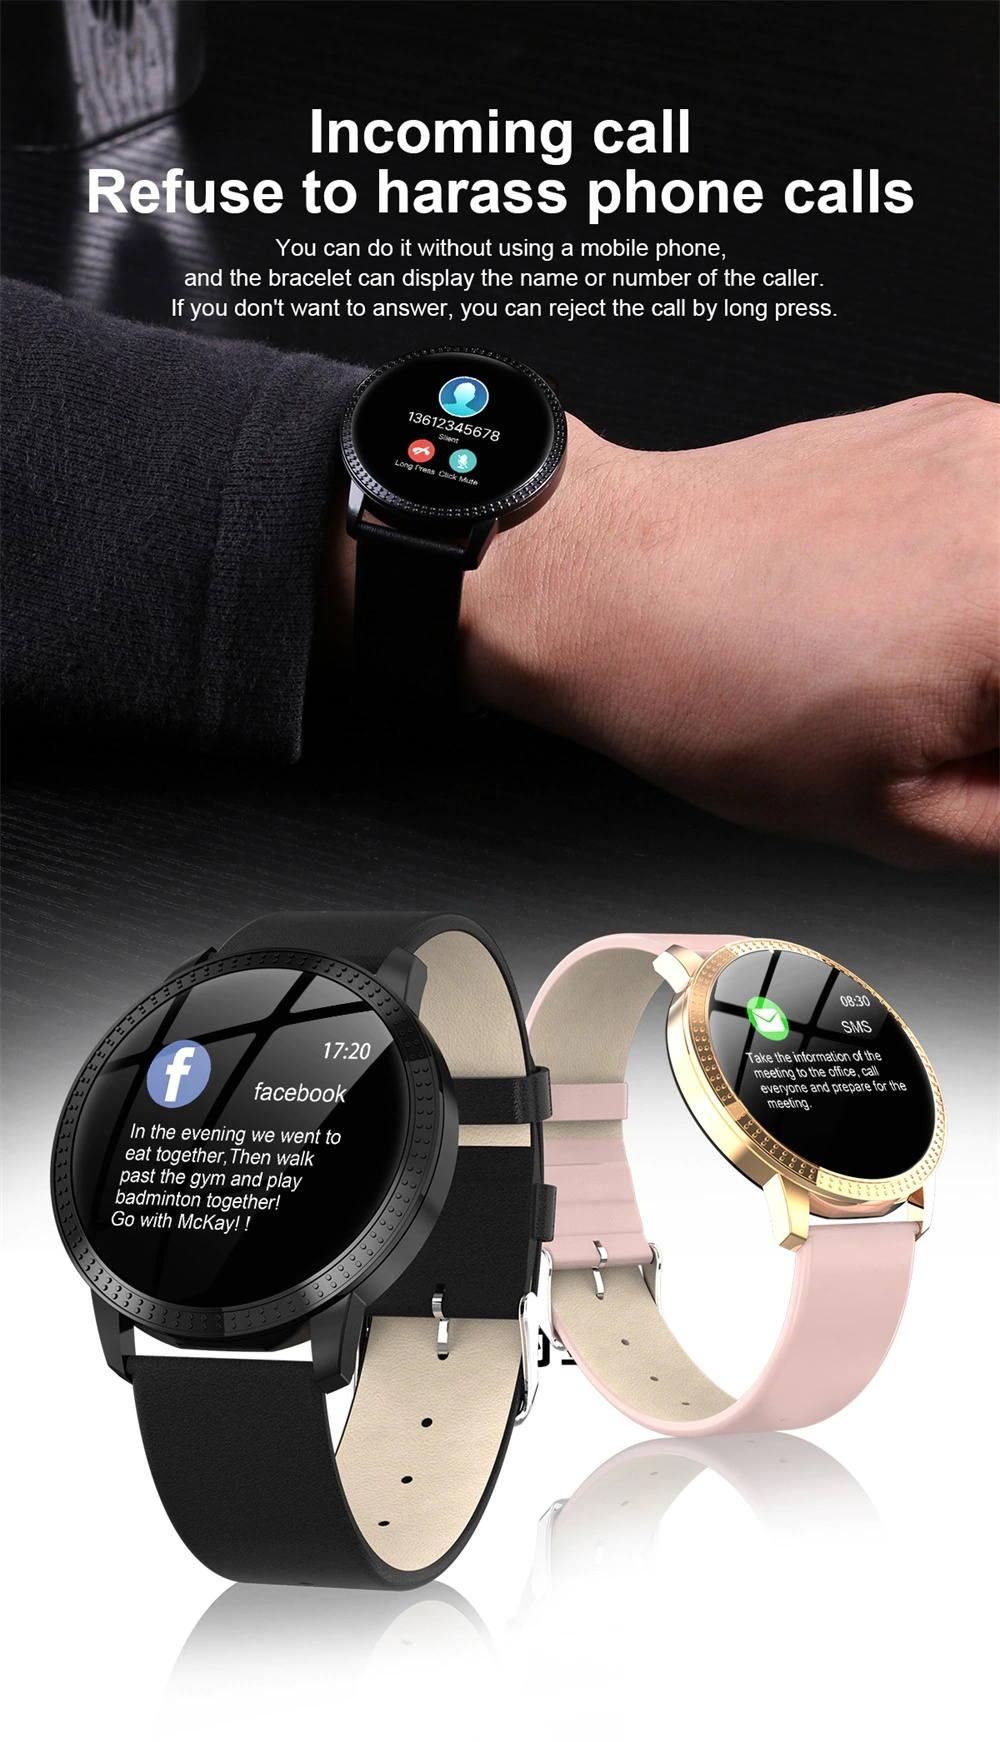 new cf18 sports smartwatch